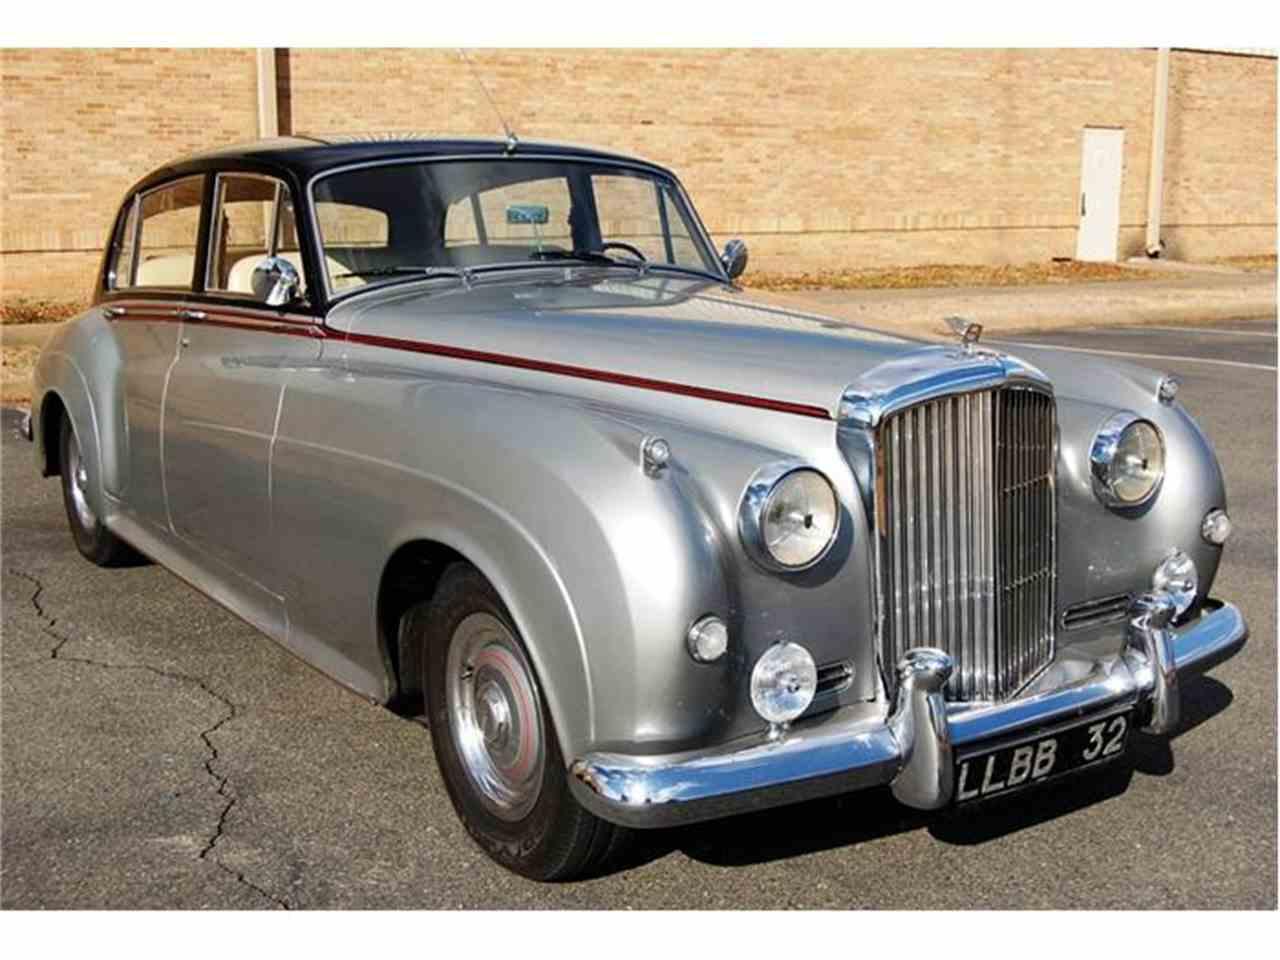 Auto For Sale Fredericksburg Va: 1962 Bentley Antique For Sale